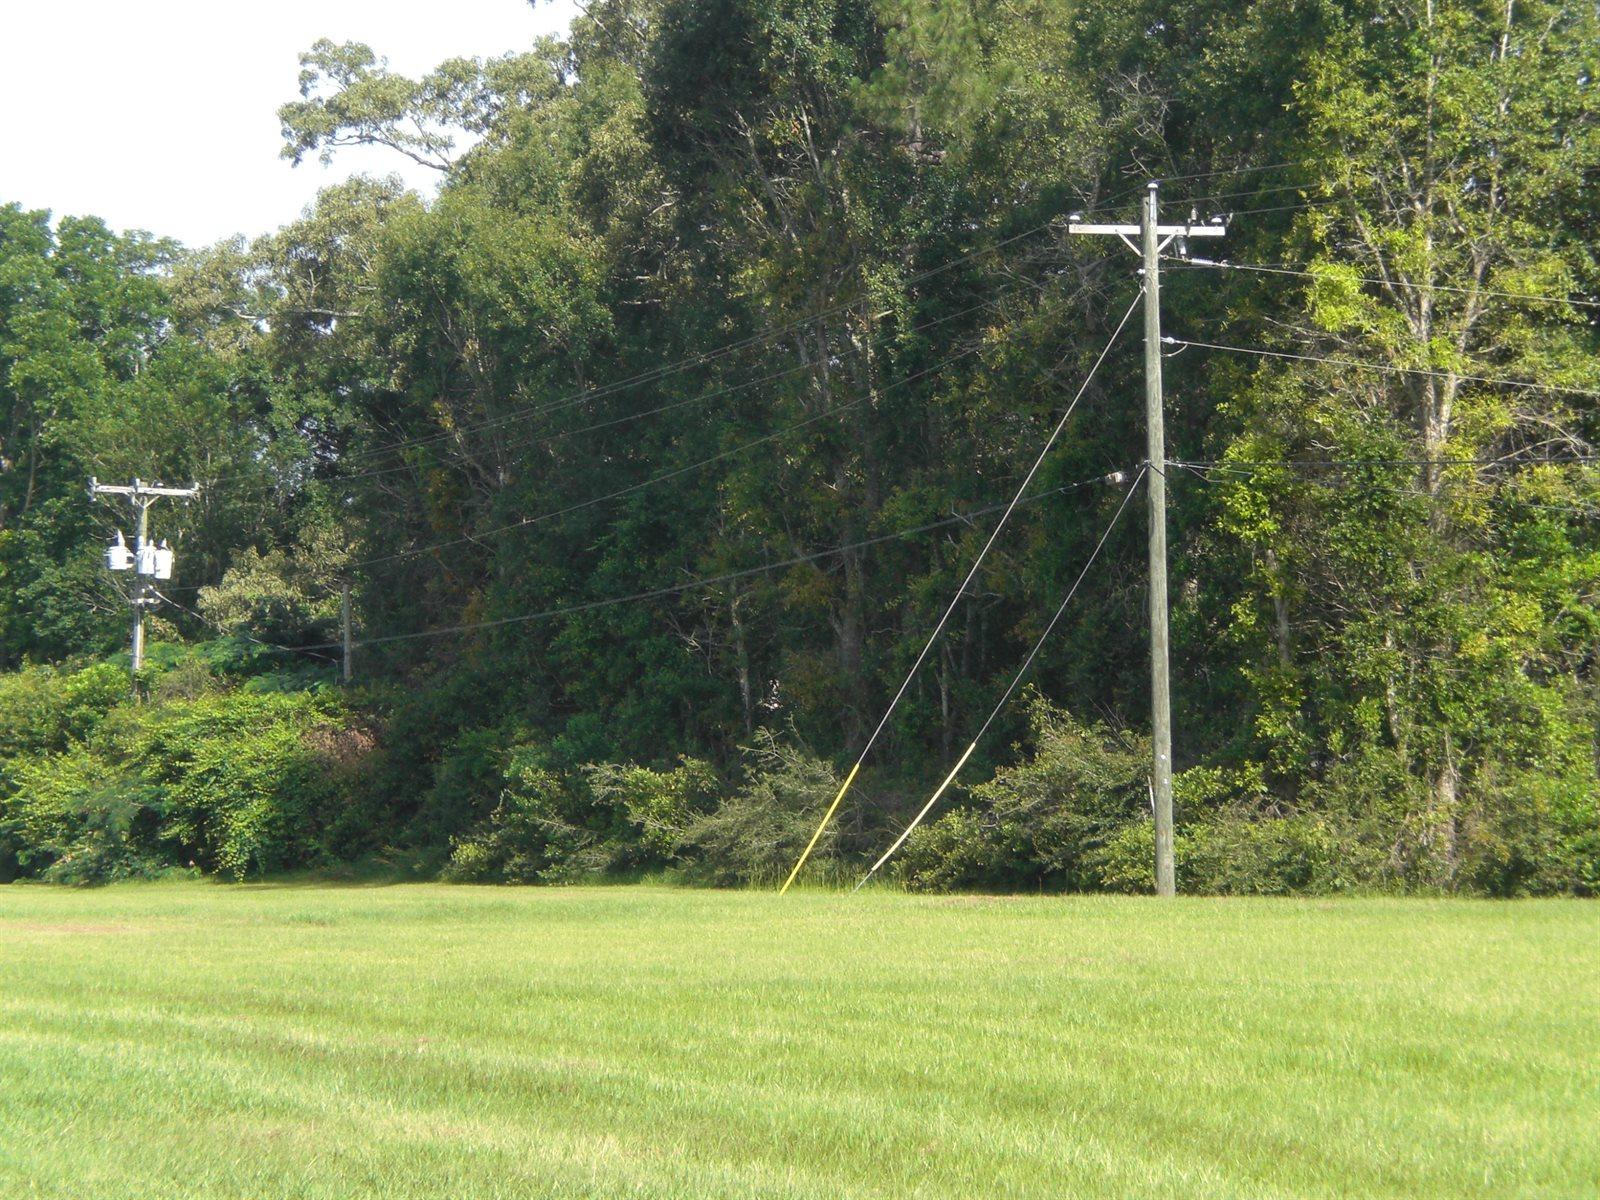 0000 North Hwy 85, Crestview, FL 32536